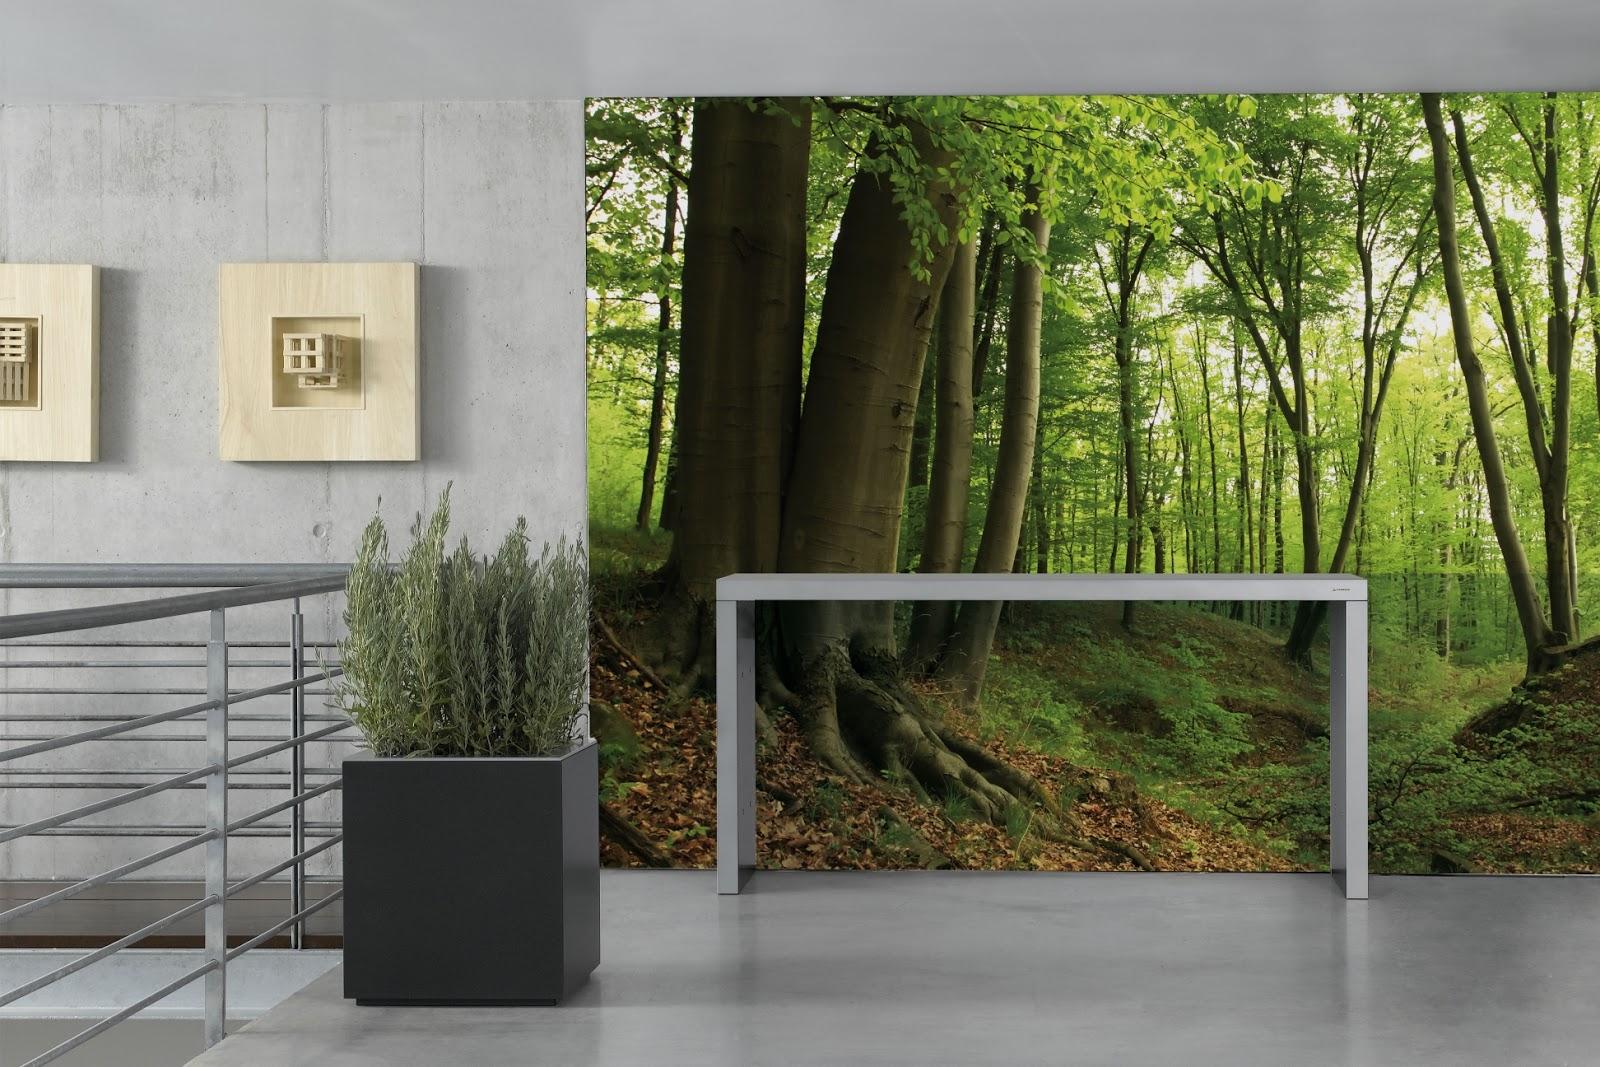 Arregui decora tus paredes con photomurales - Decorar con fotomurales ...